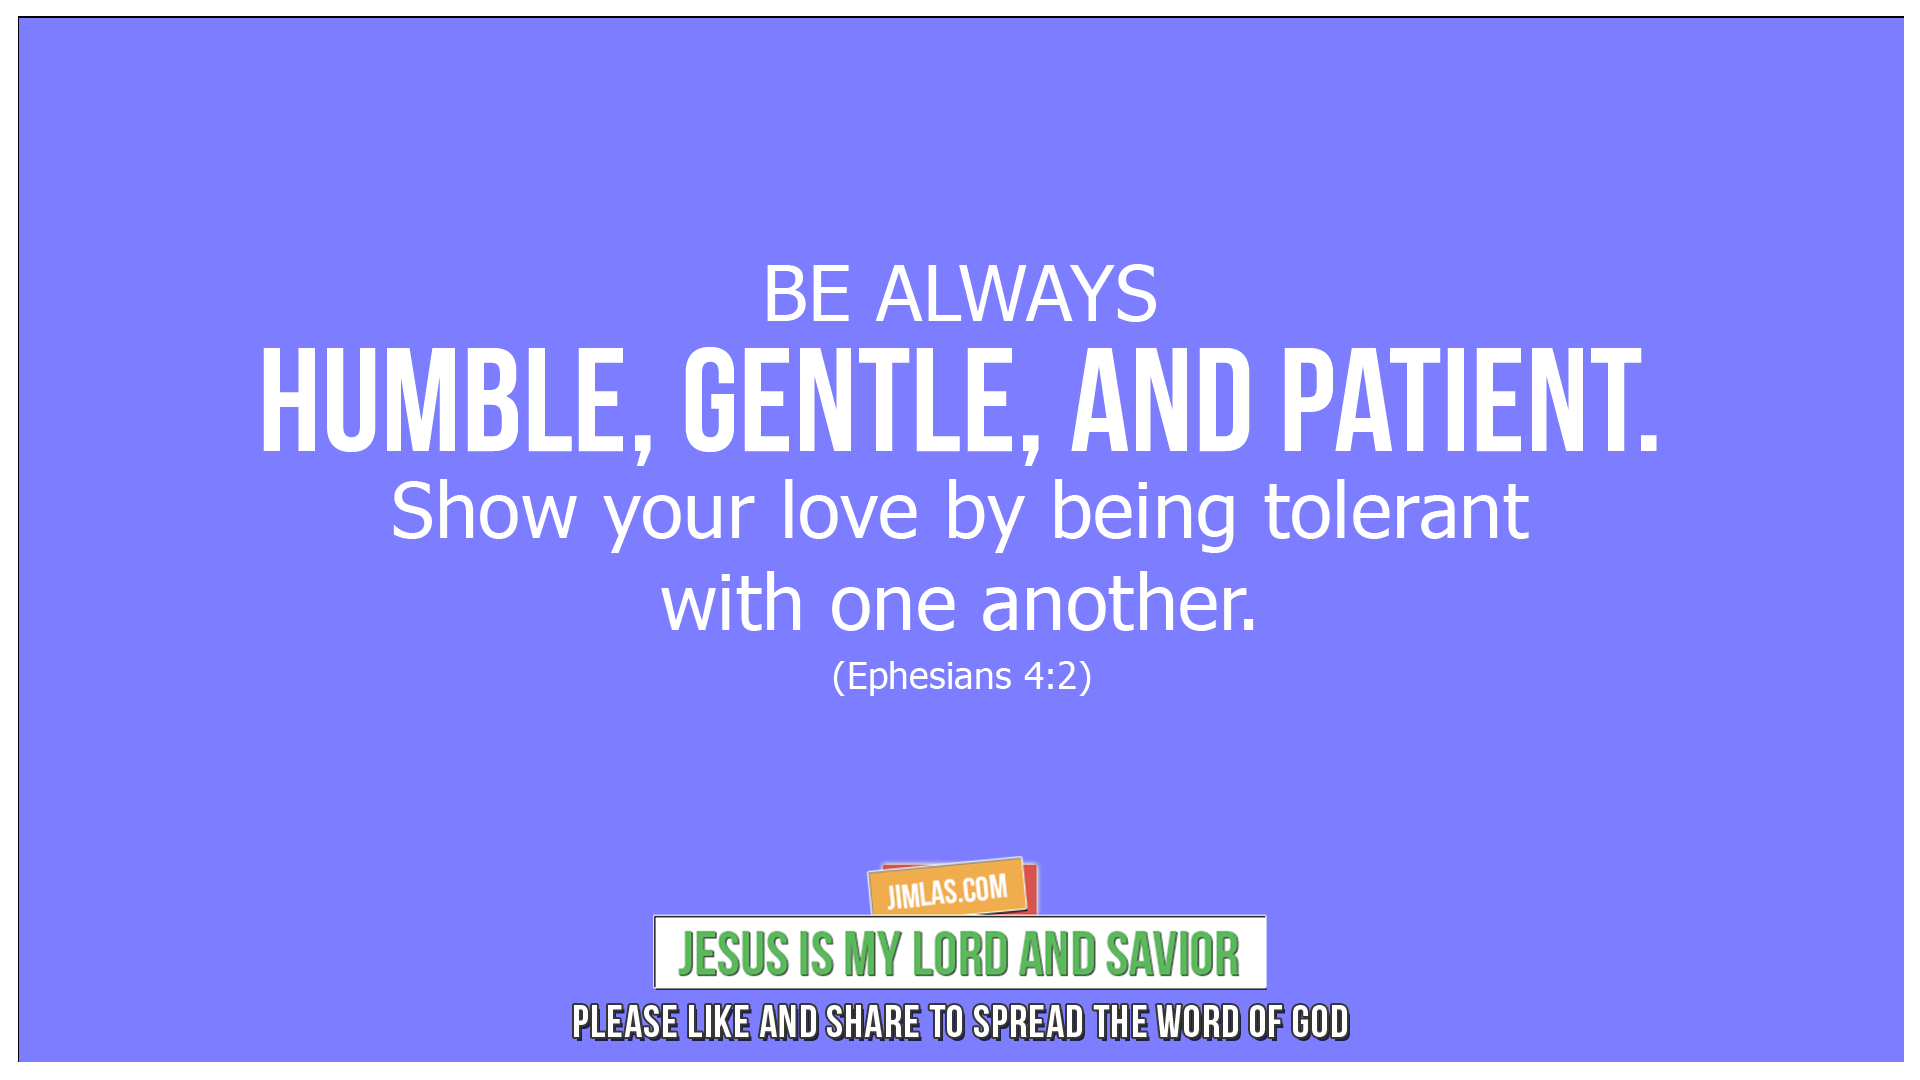 ephesians 4 2, Ephesians 4:2